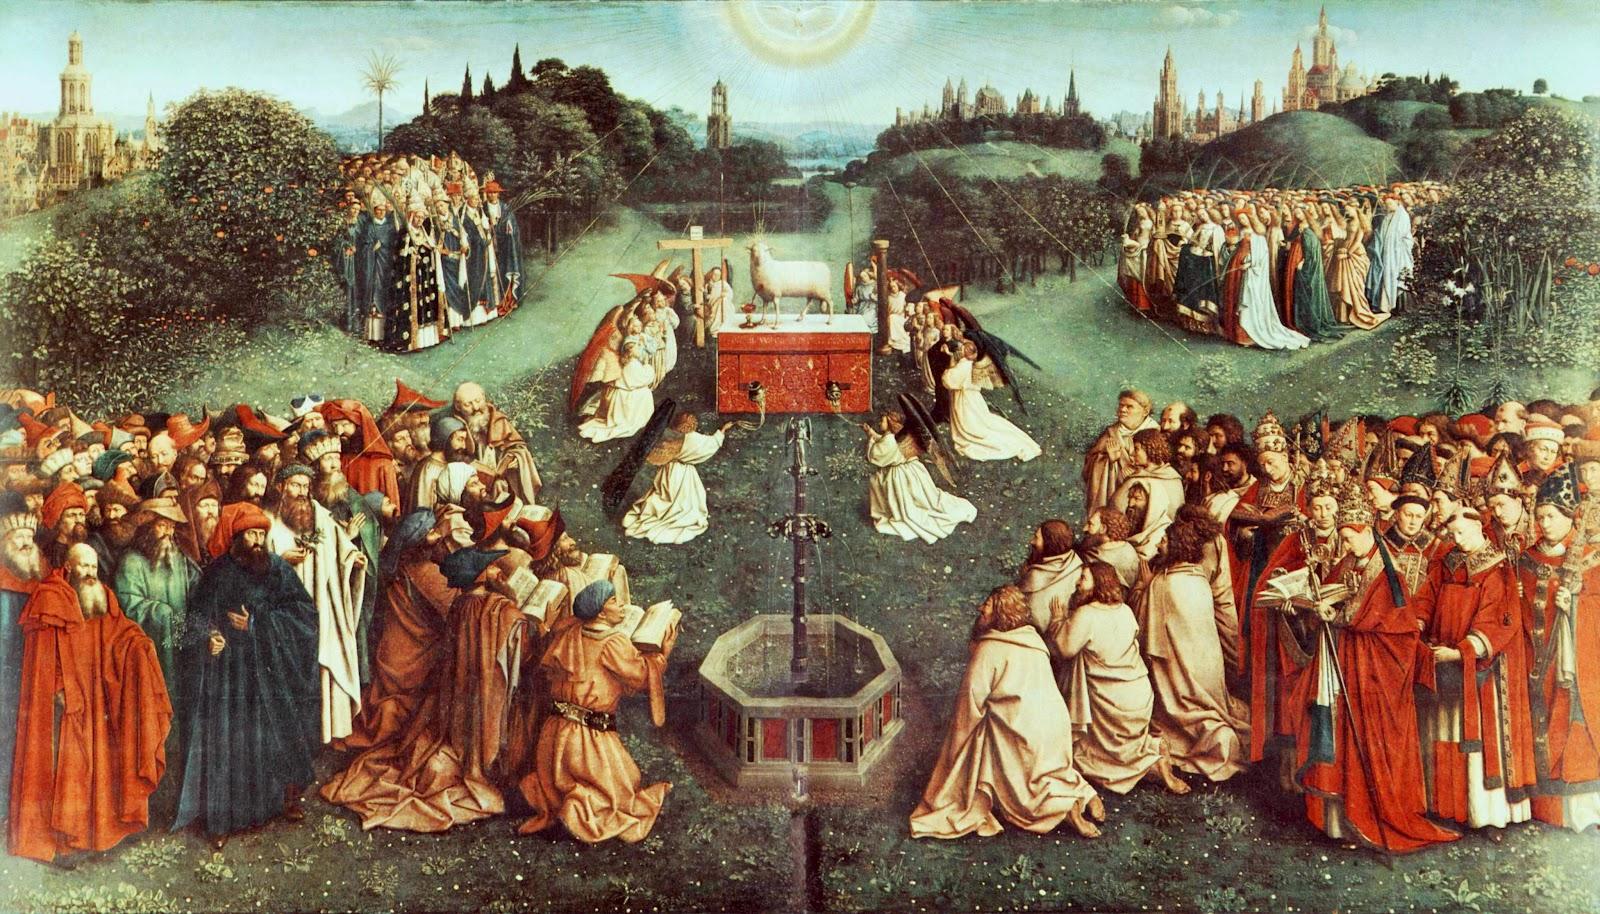 rev. 5 - throne of heaven